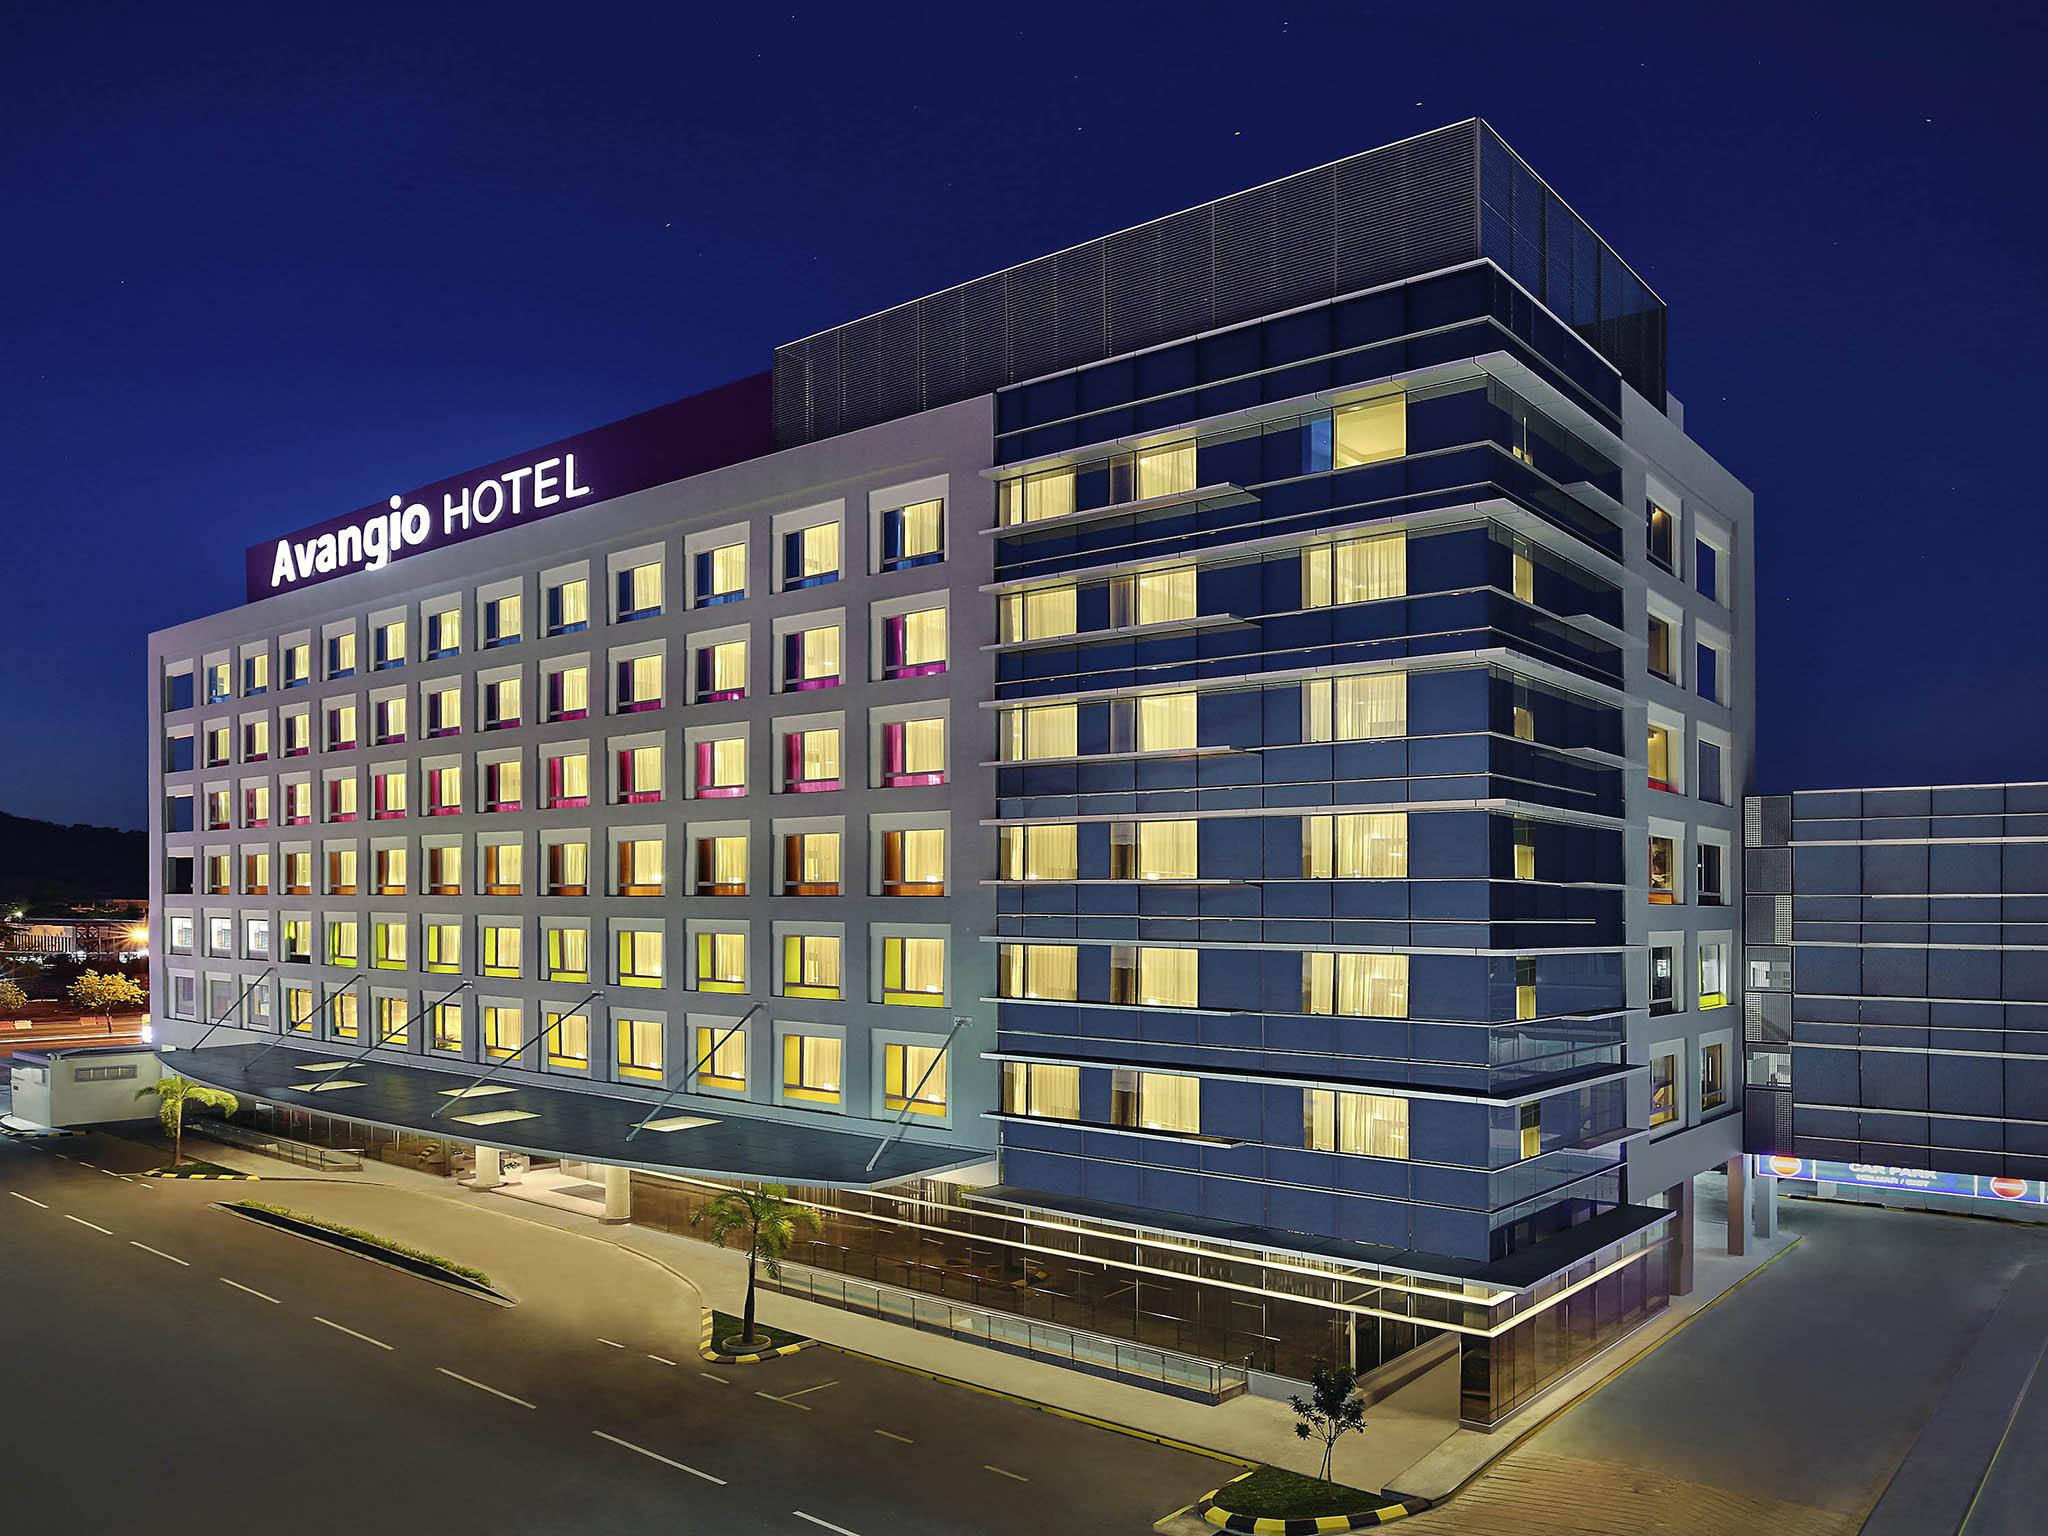 Hotel – Avangio Hotel Kota Kinabalu - beheerd door AccorHotels